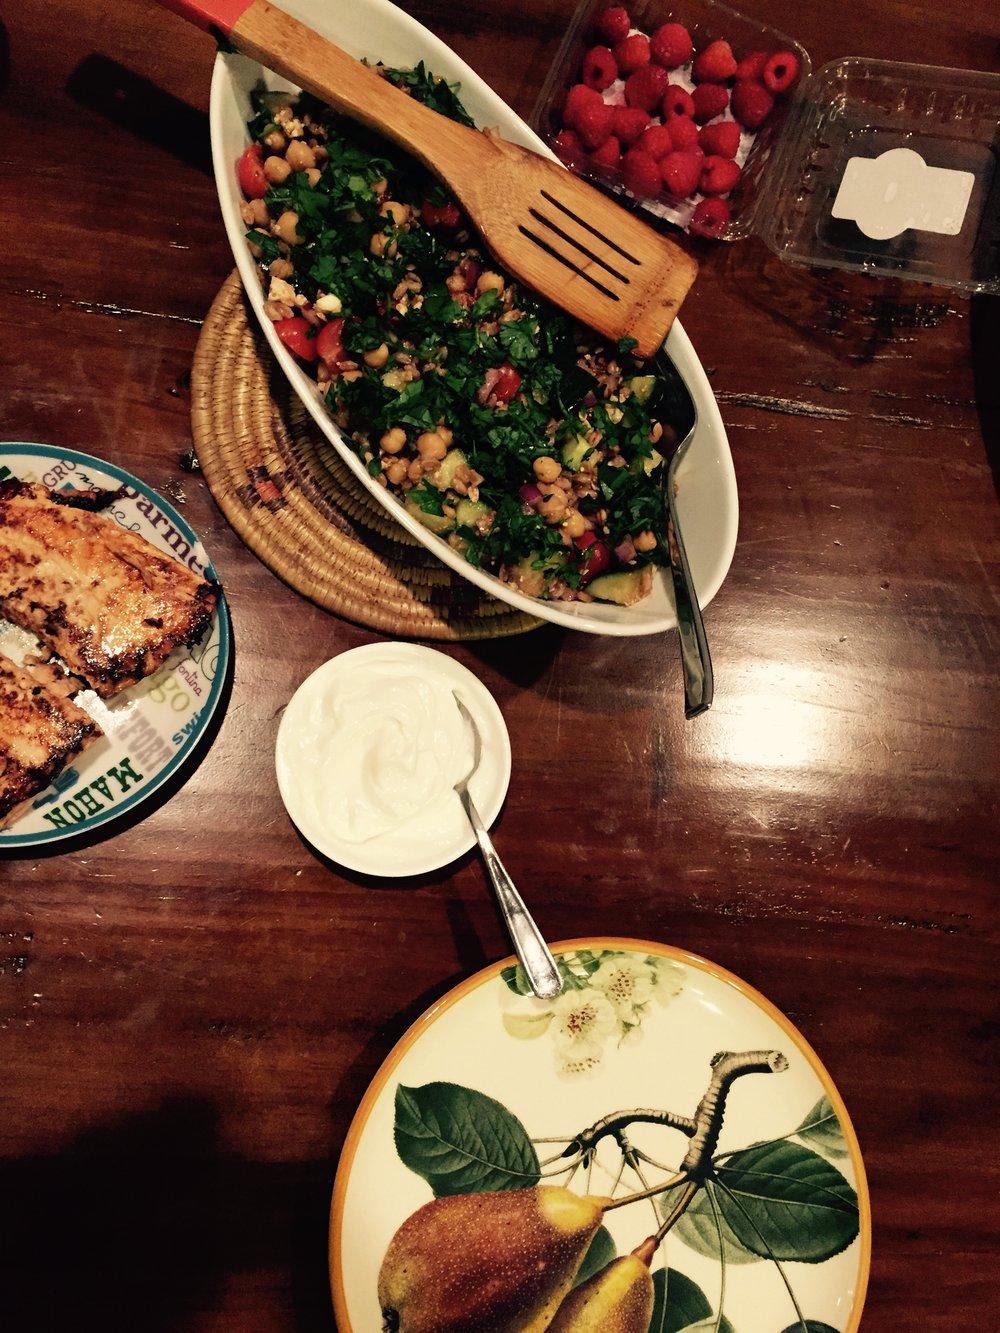 - We served it alongside some grilled salmon, raspberries & fresh yogurt